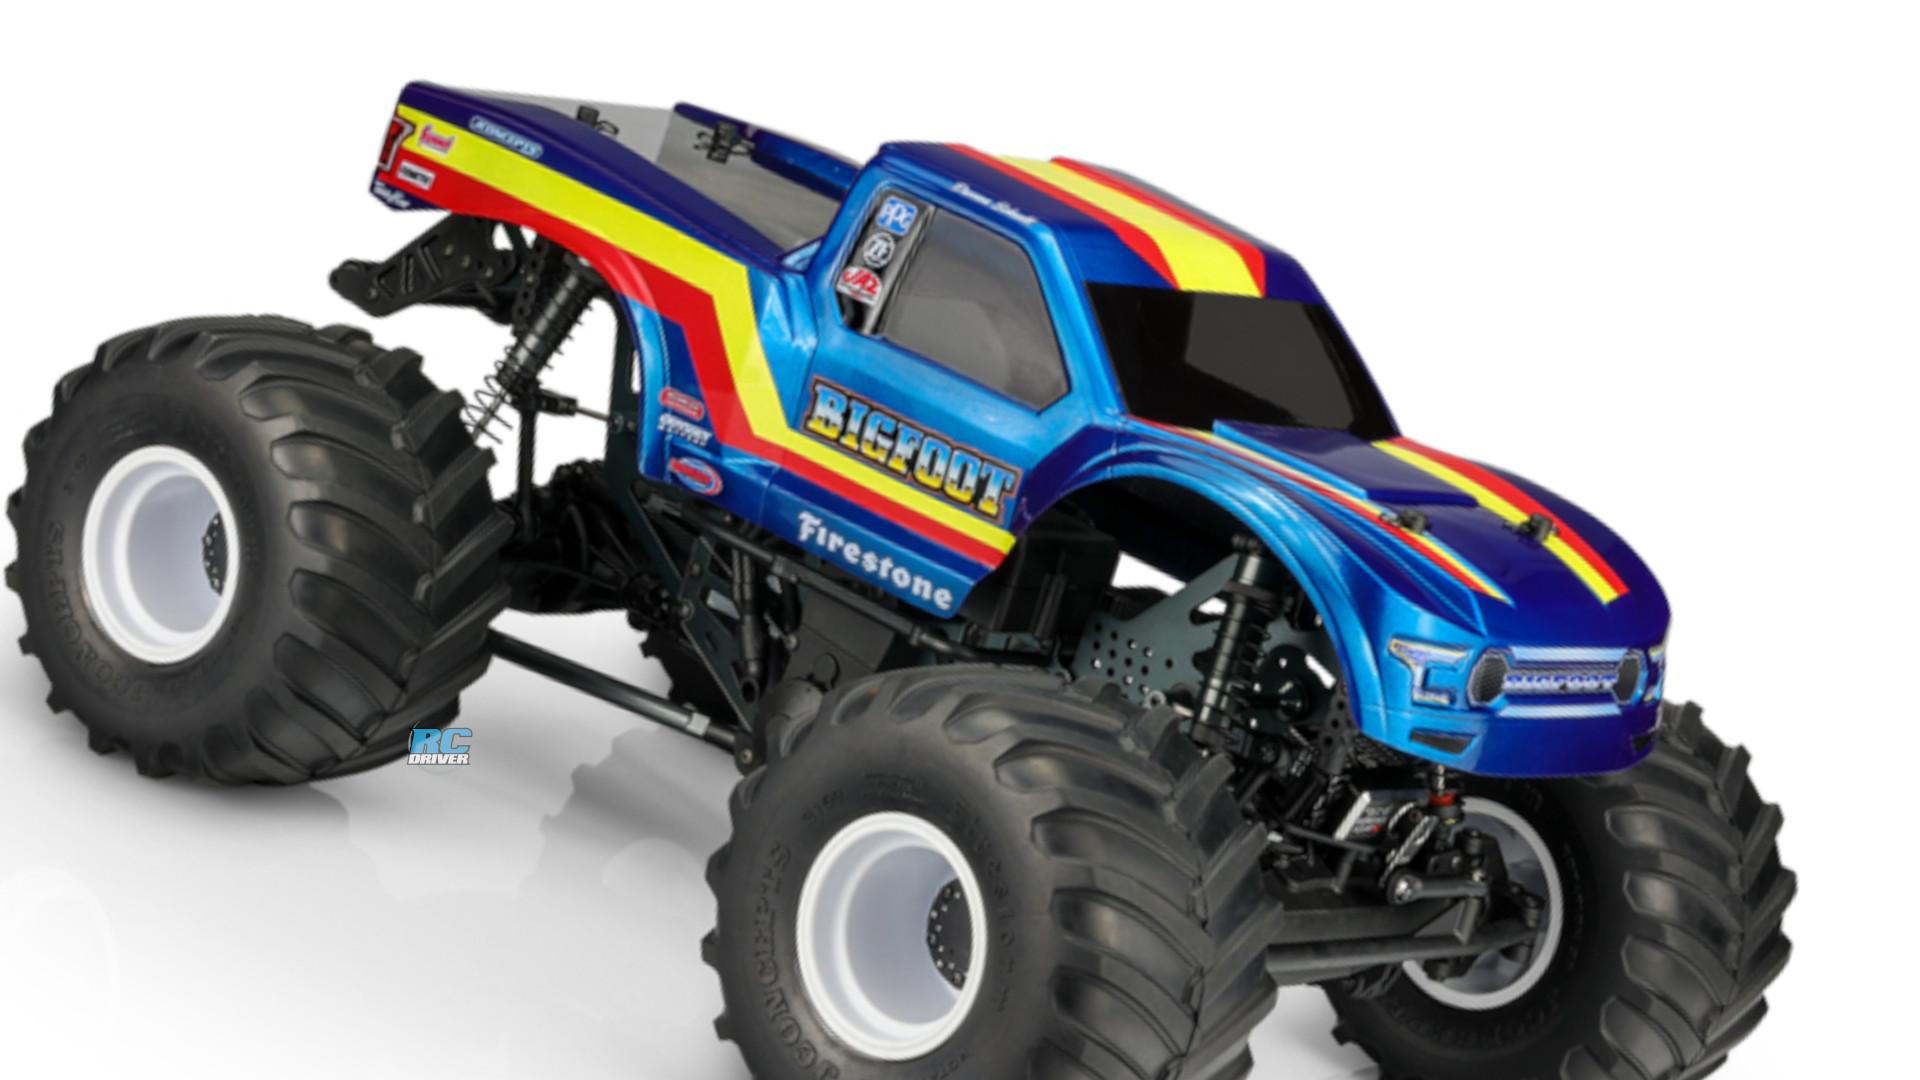 JConcepts 2020 Ford Raptor With Bigfoot 19 Racer Stripe